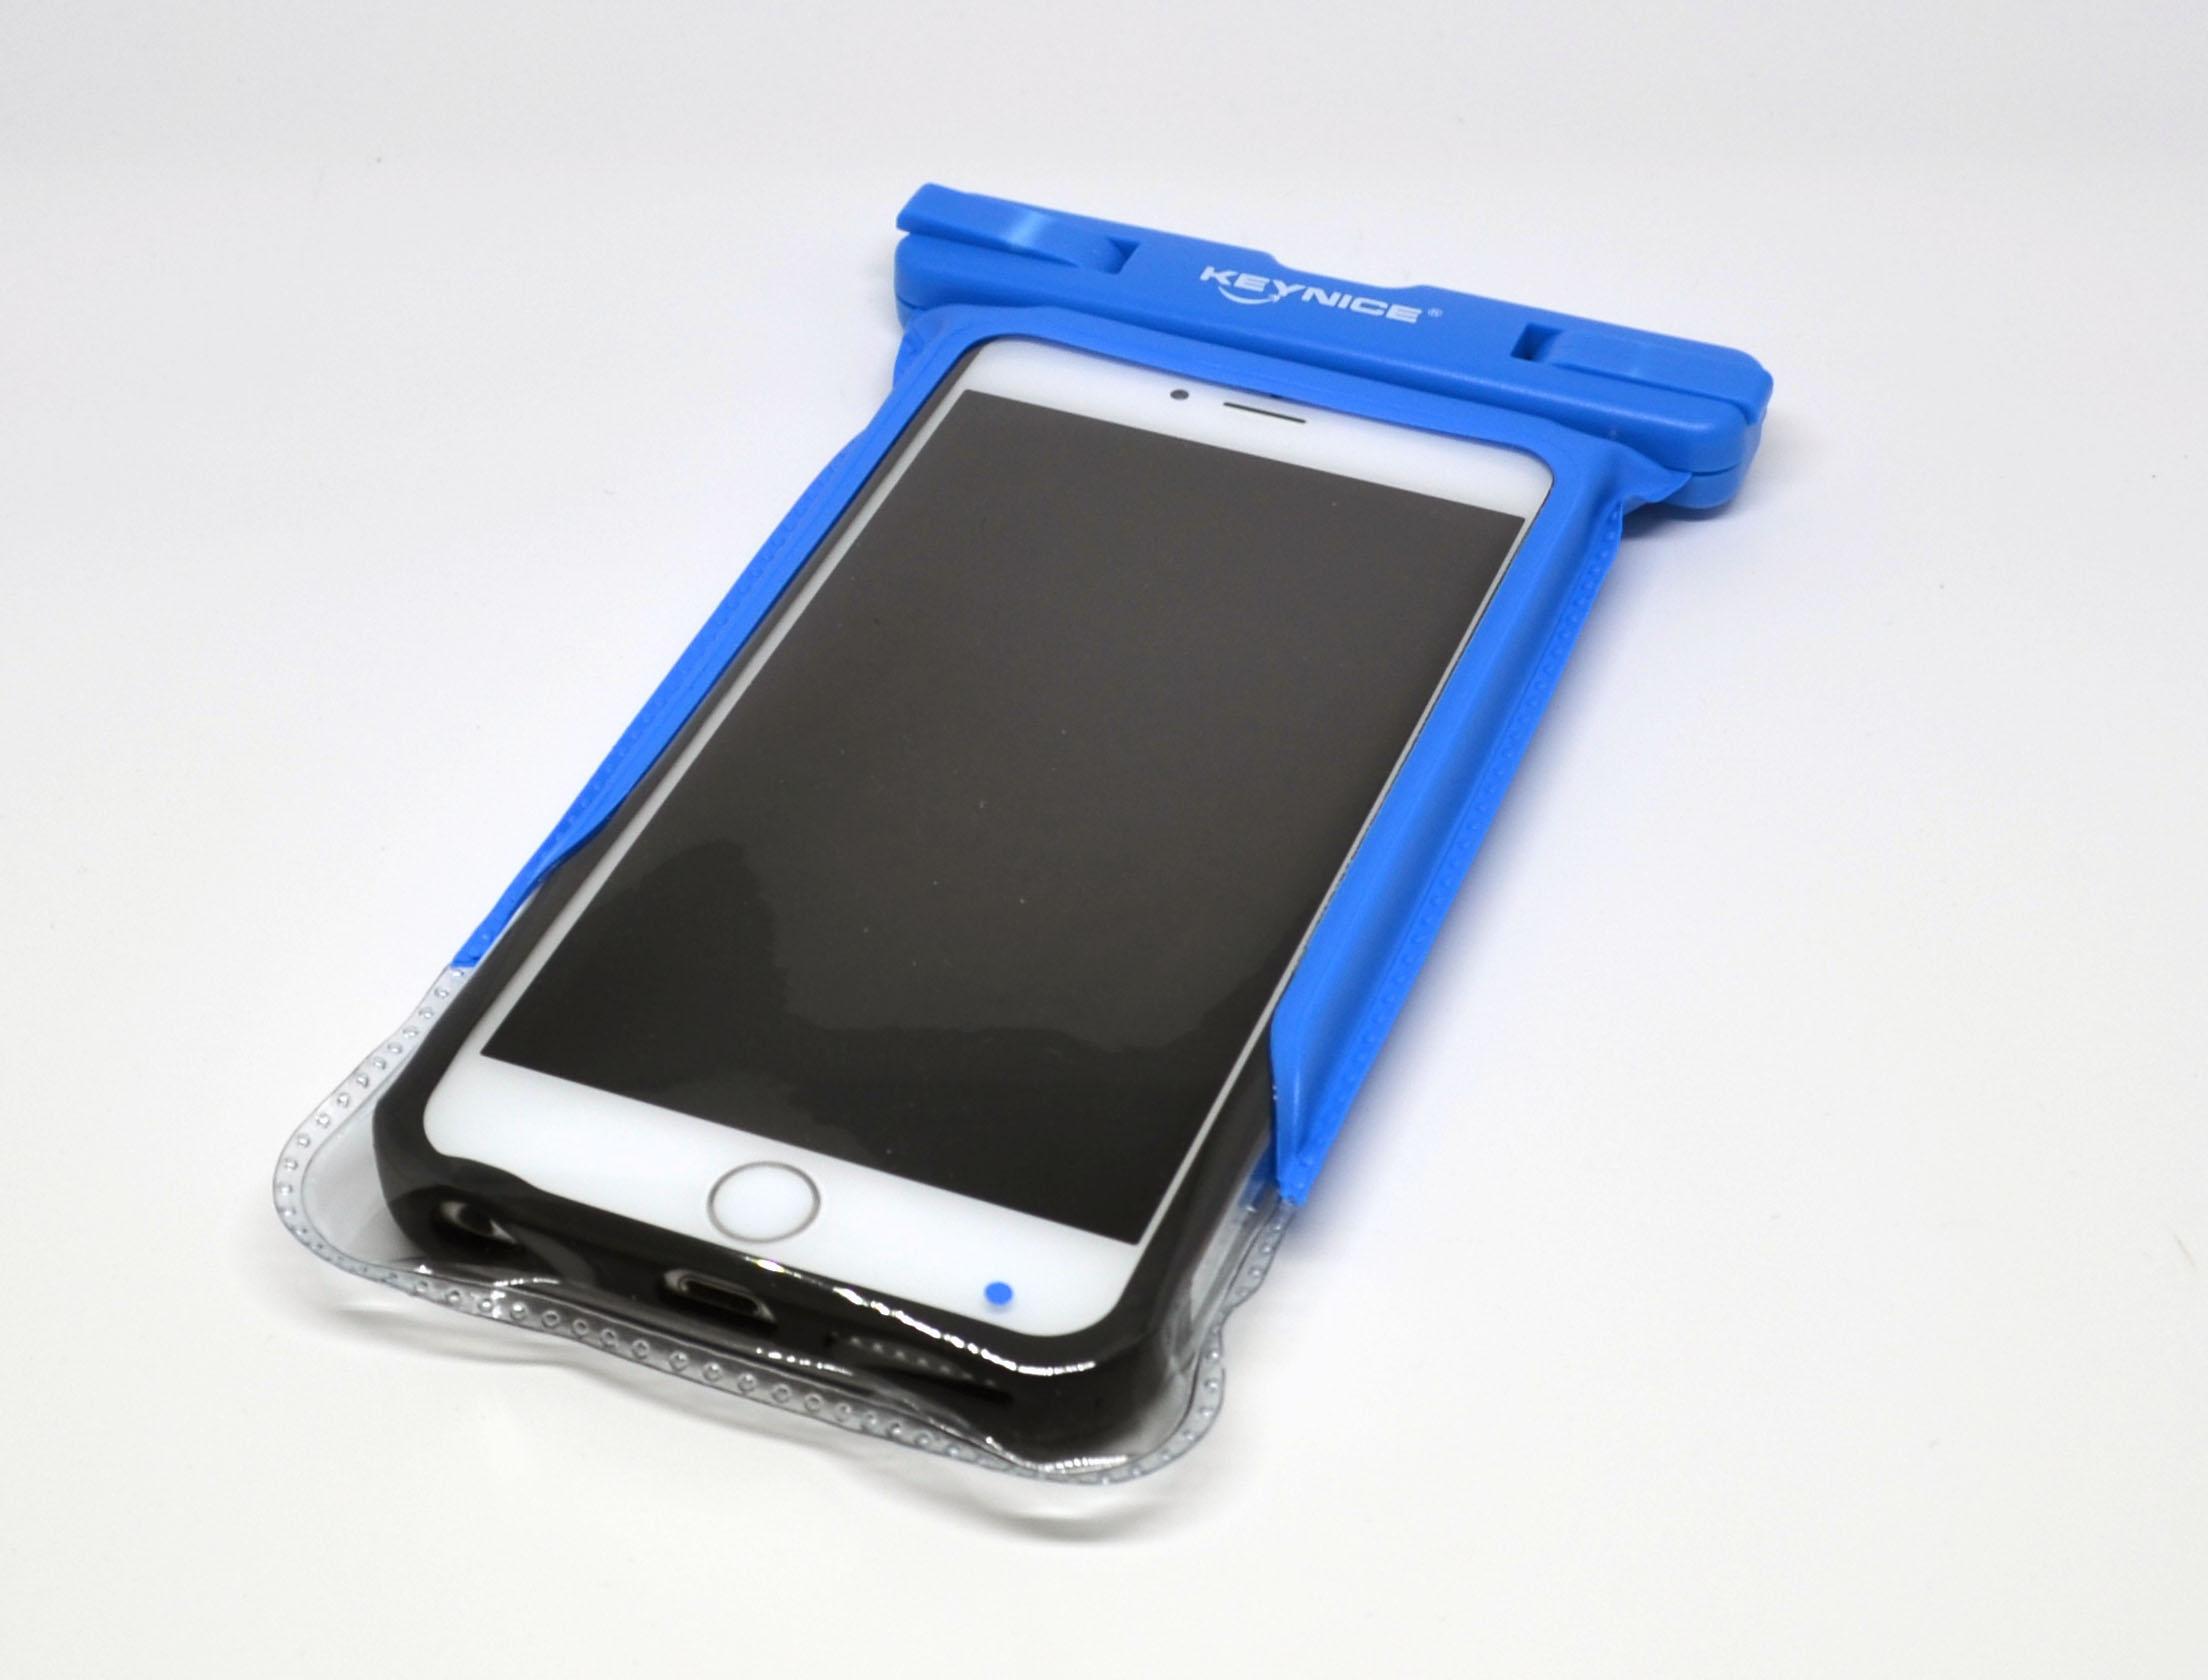 Review: Keynice Universal Waterproof Case for Smartphones